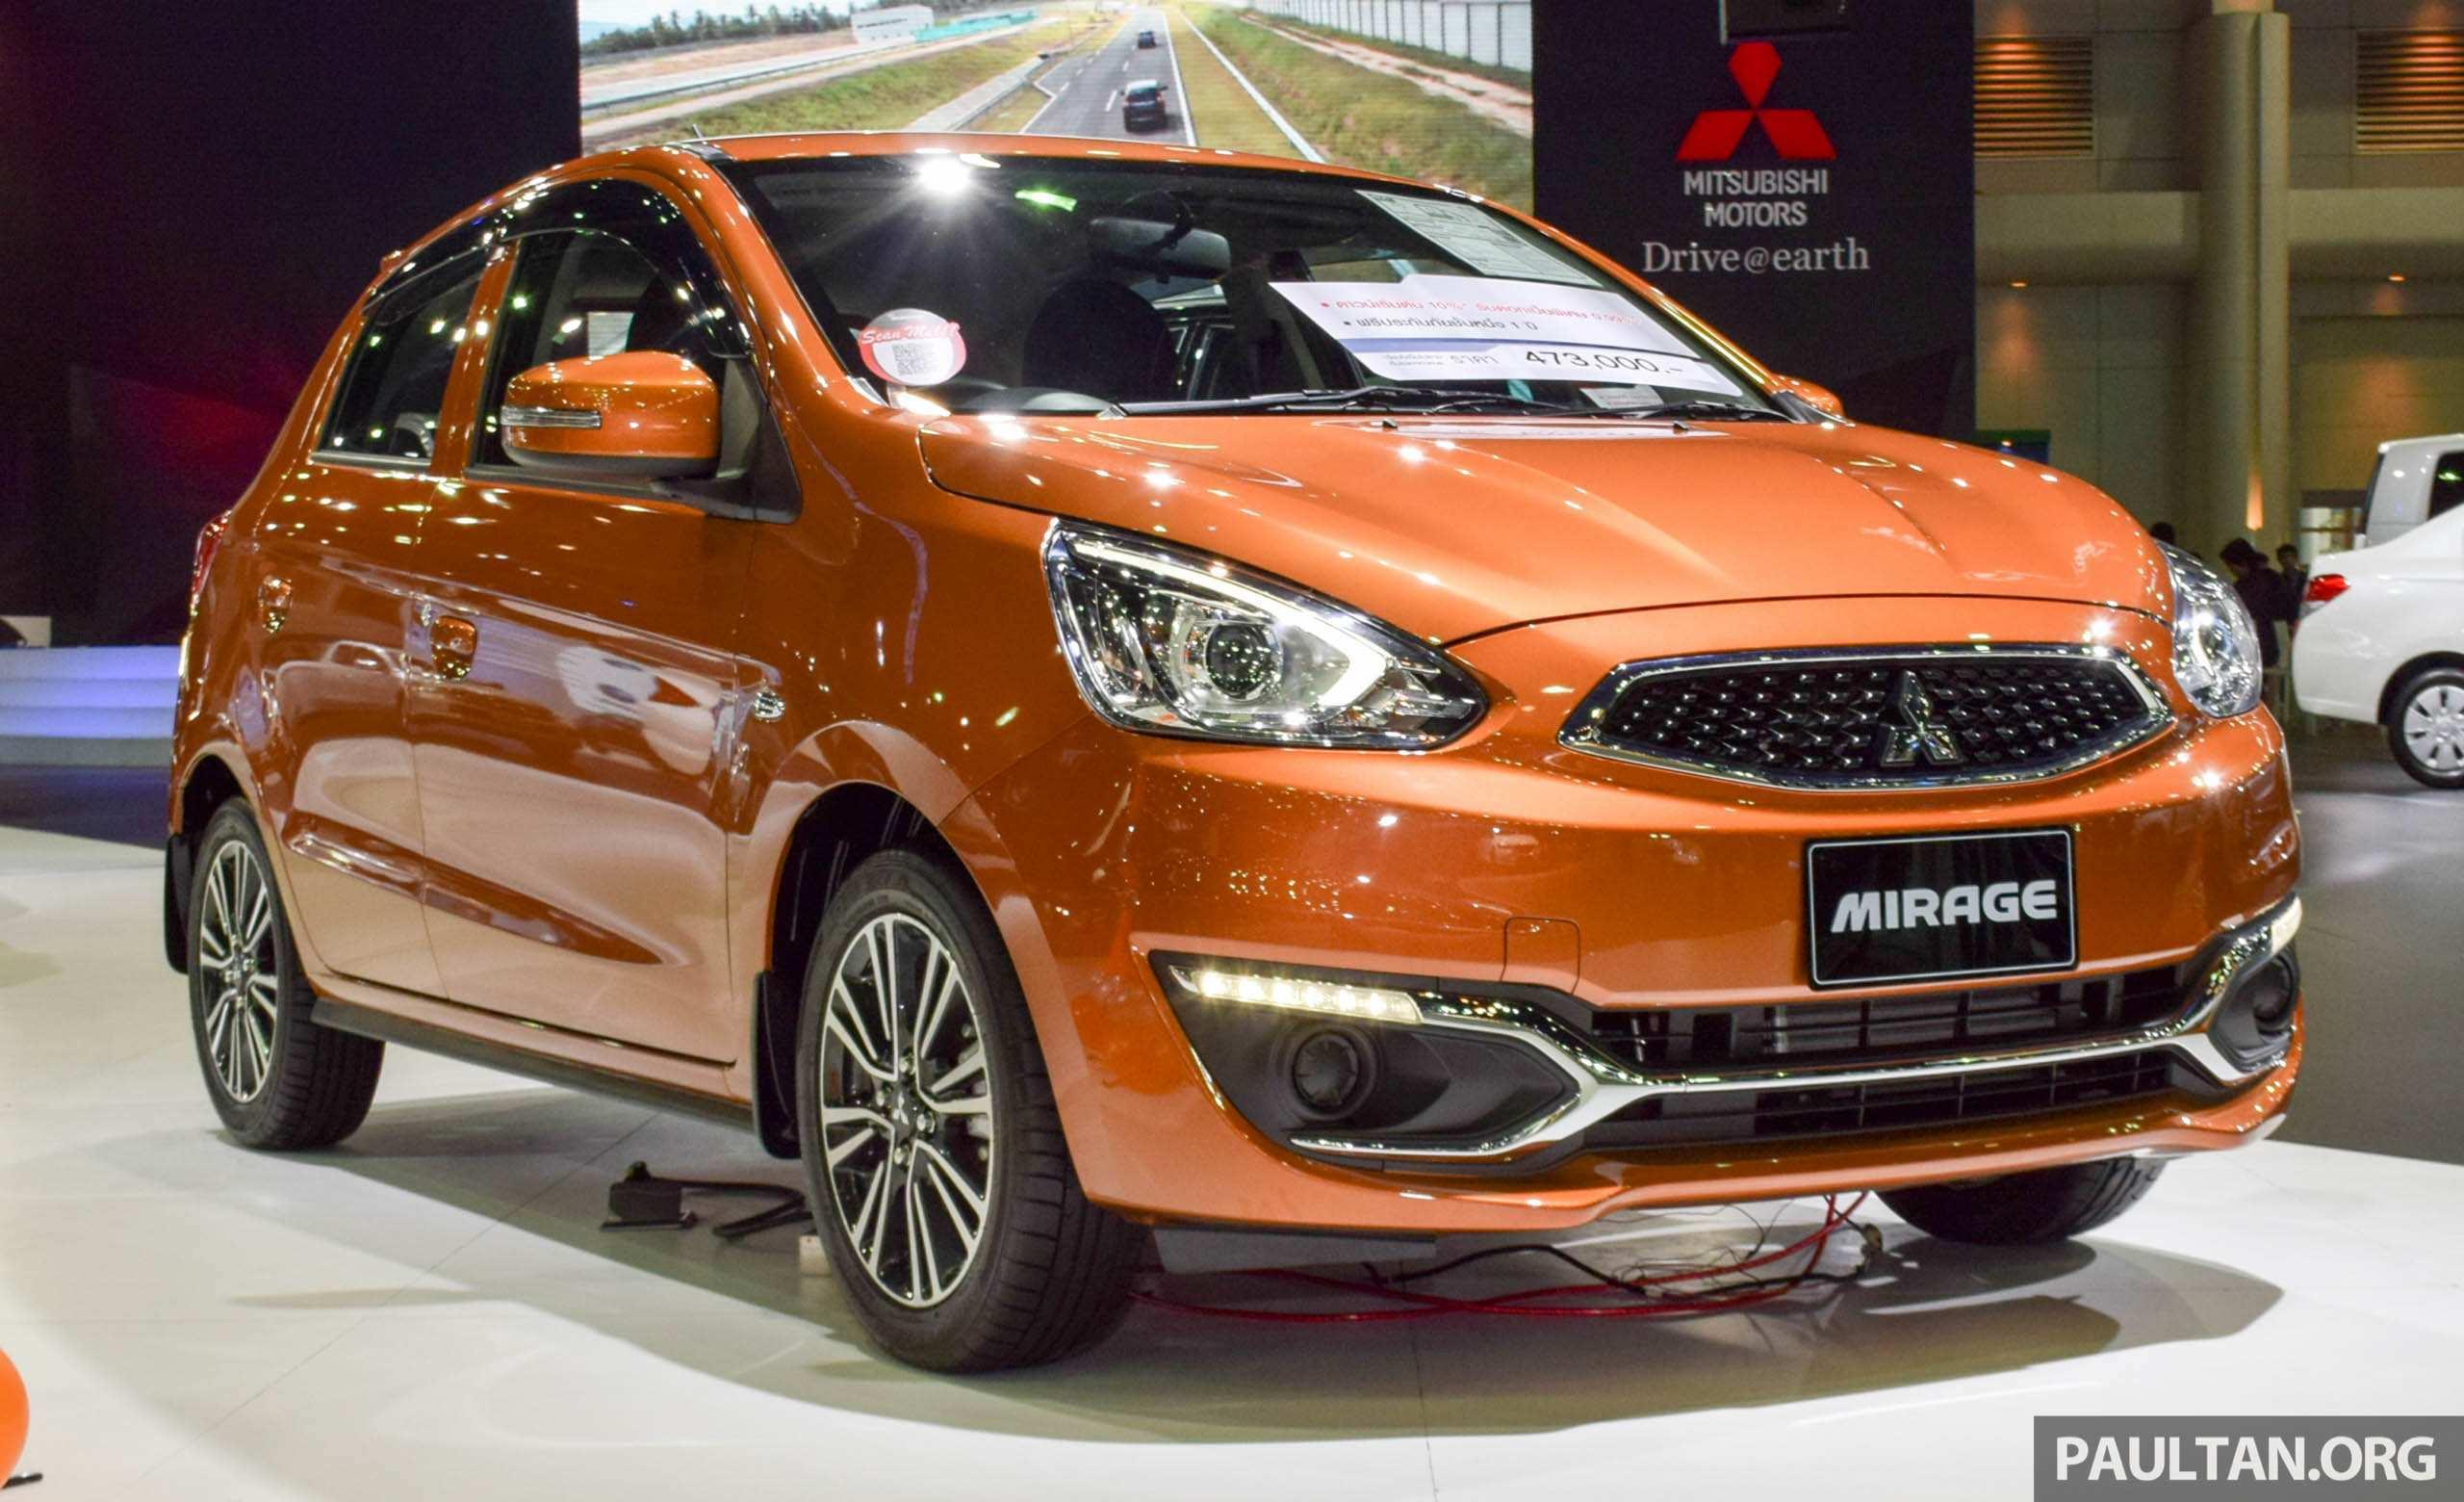 96 Concept of 2019 Mitsubishi Mirage Prices for 2019 Mitsubishi Mirage